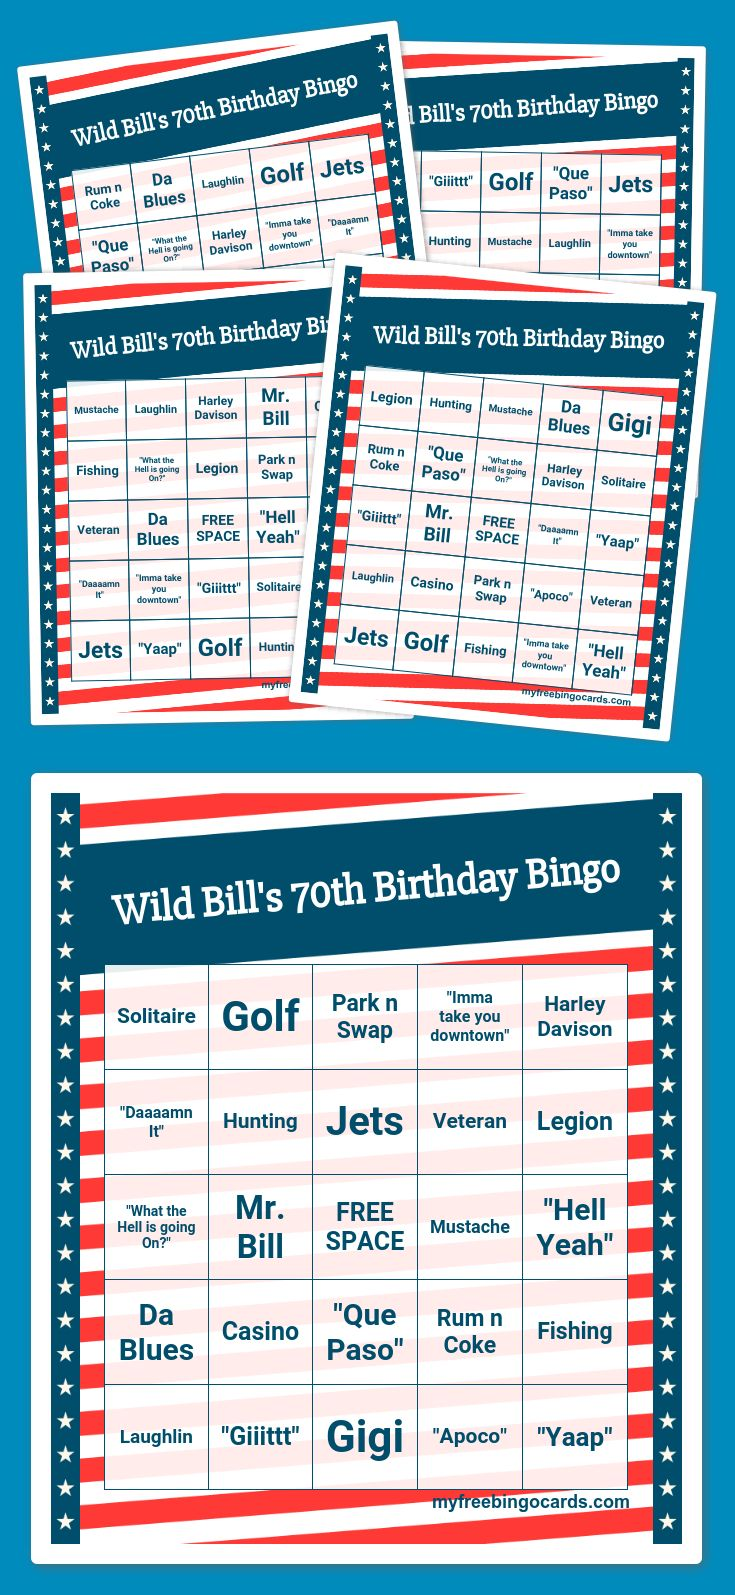 Wild Bill's 70th Birthday Bingo Bingo card generator